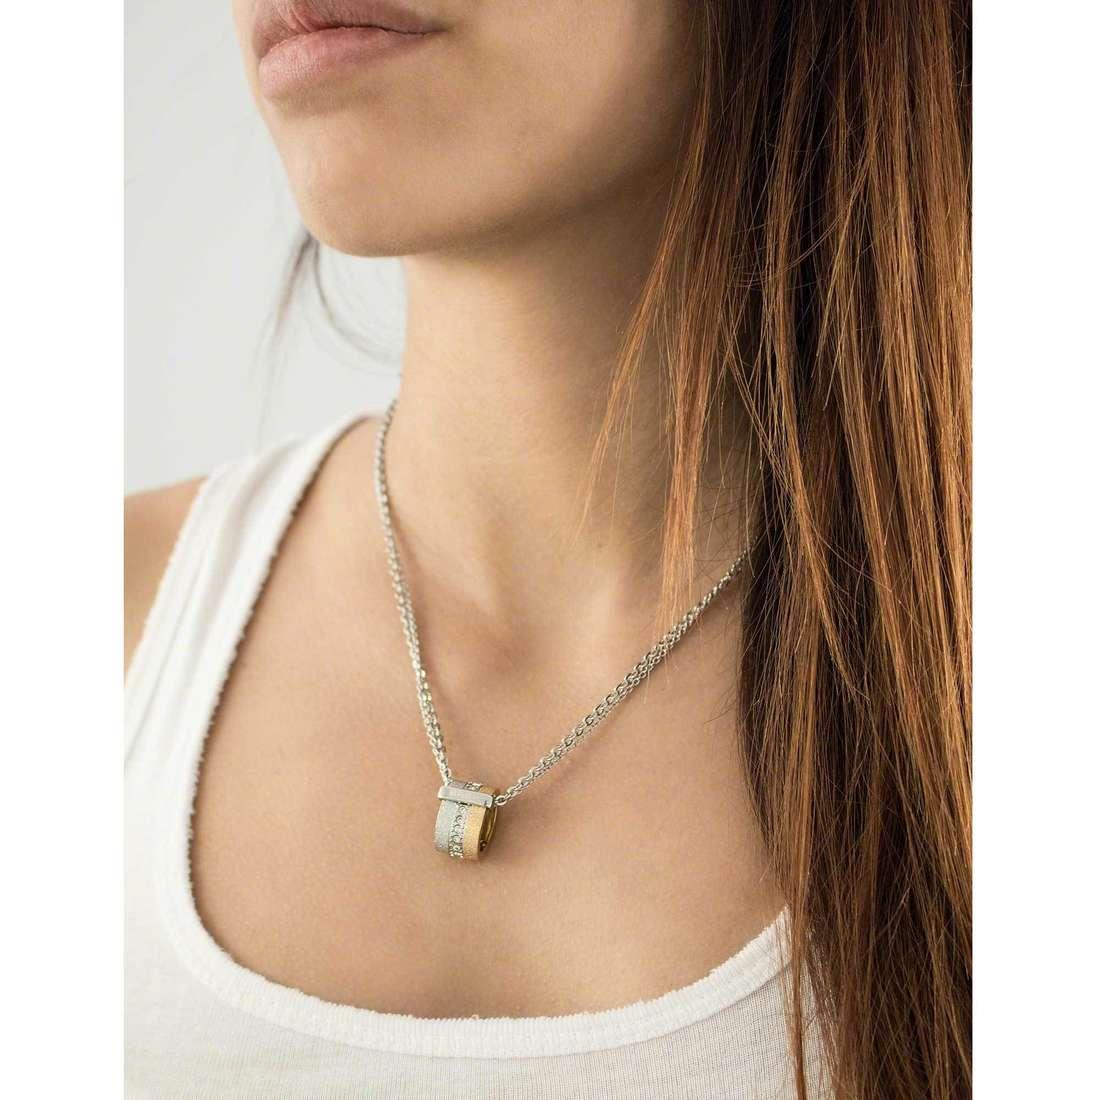 Breil colliers Breilogy femme TJ1430 indosso